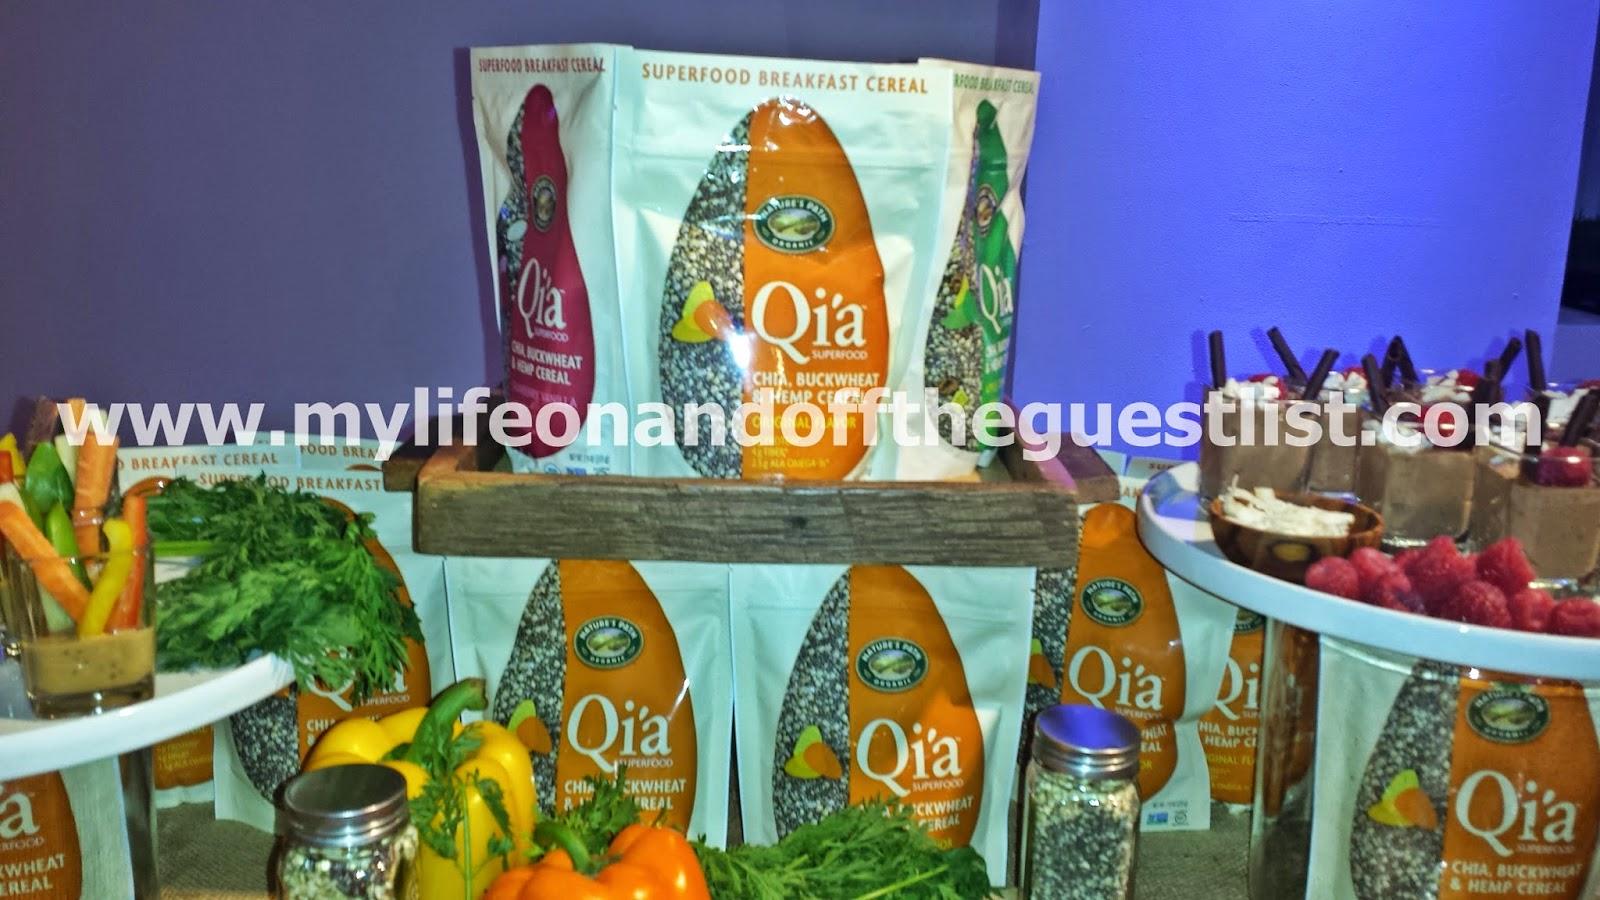 Qi'a Superfood - www.mylifeonandofftheguestlist.com